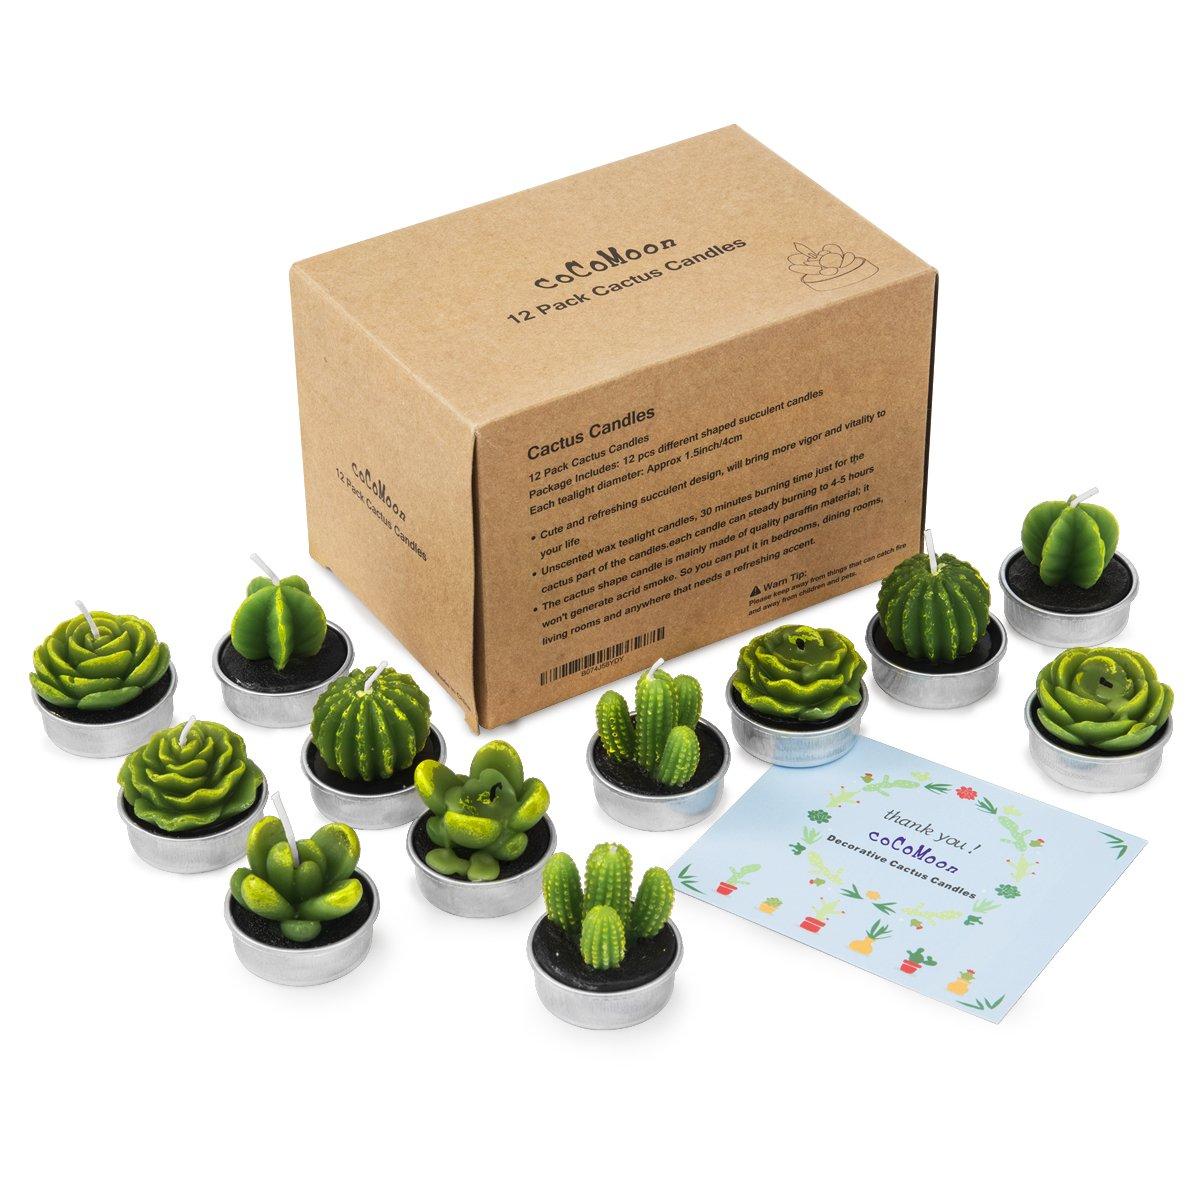 Quality Cactus Tealight Candles Tea Light Candle Holder 12 Pcs,COCOMOON Home Decor